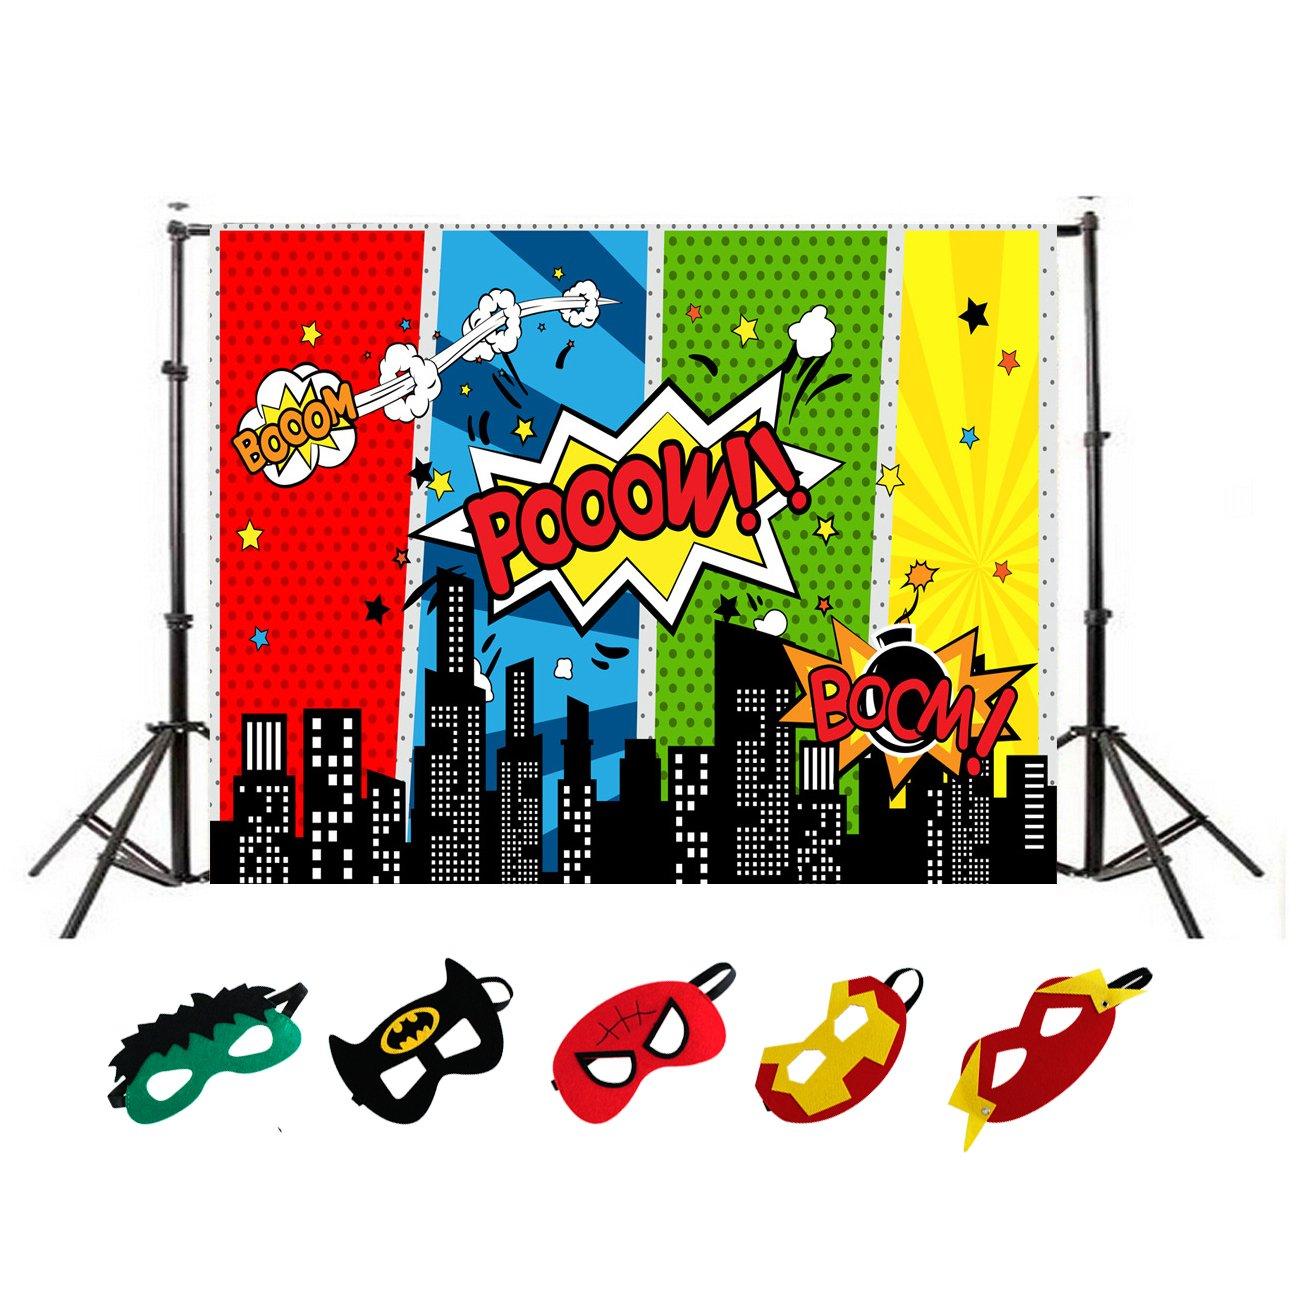 5 x 3ft Superhero City Photography Backdrop and Superhero Masks for Kids Birthday Party Decoration, Studio Superhero Photography Background